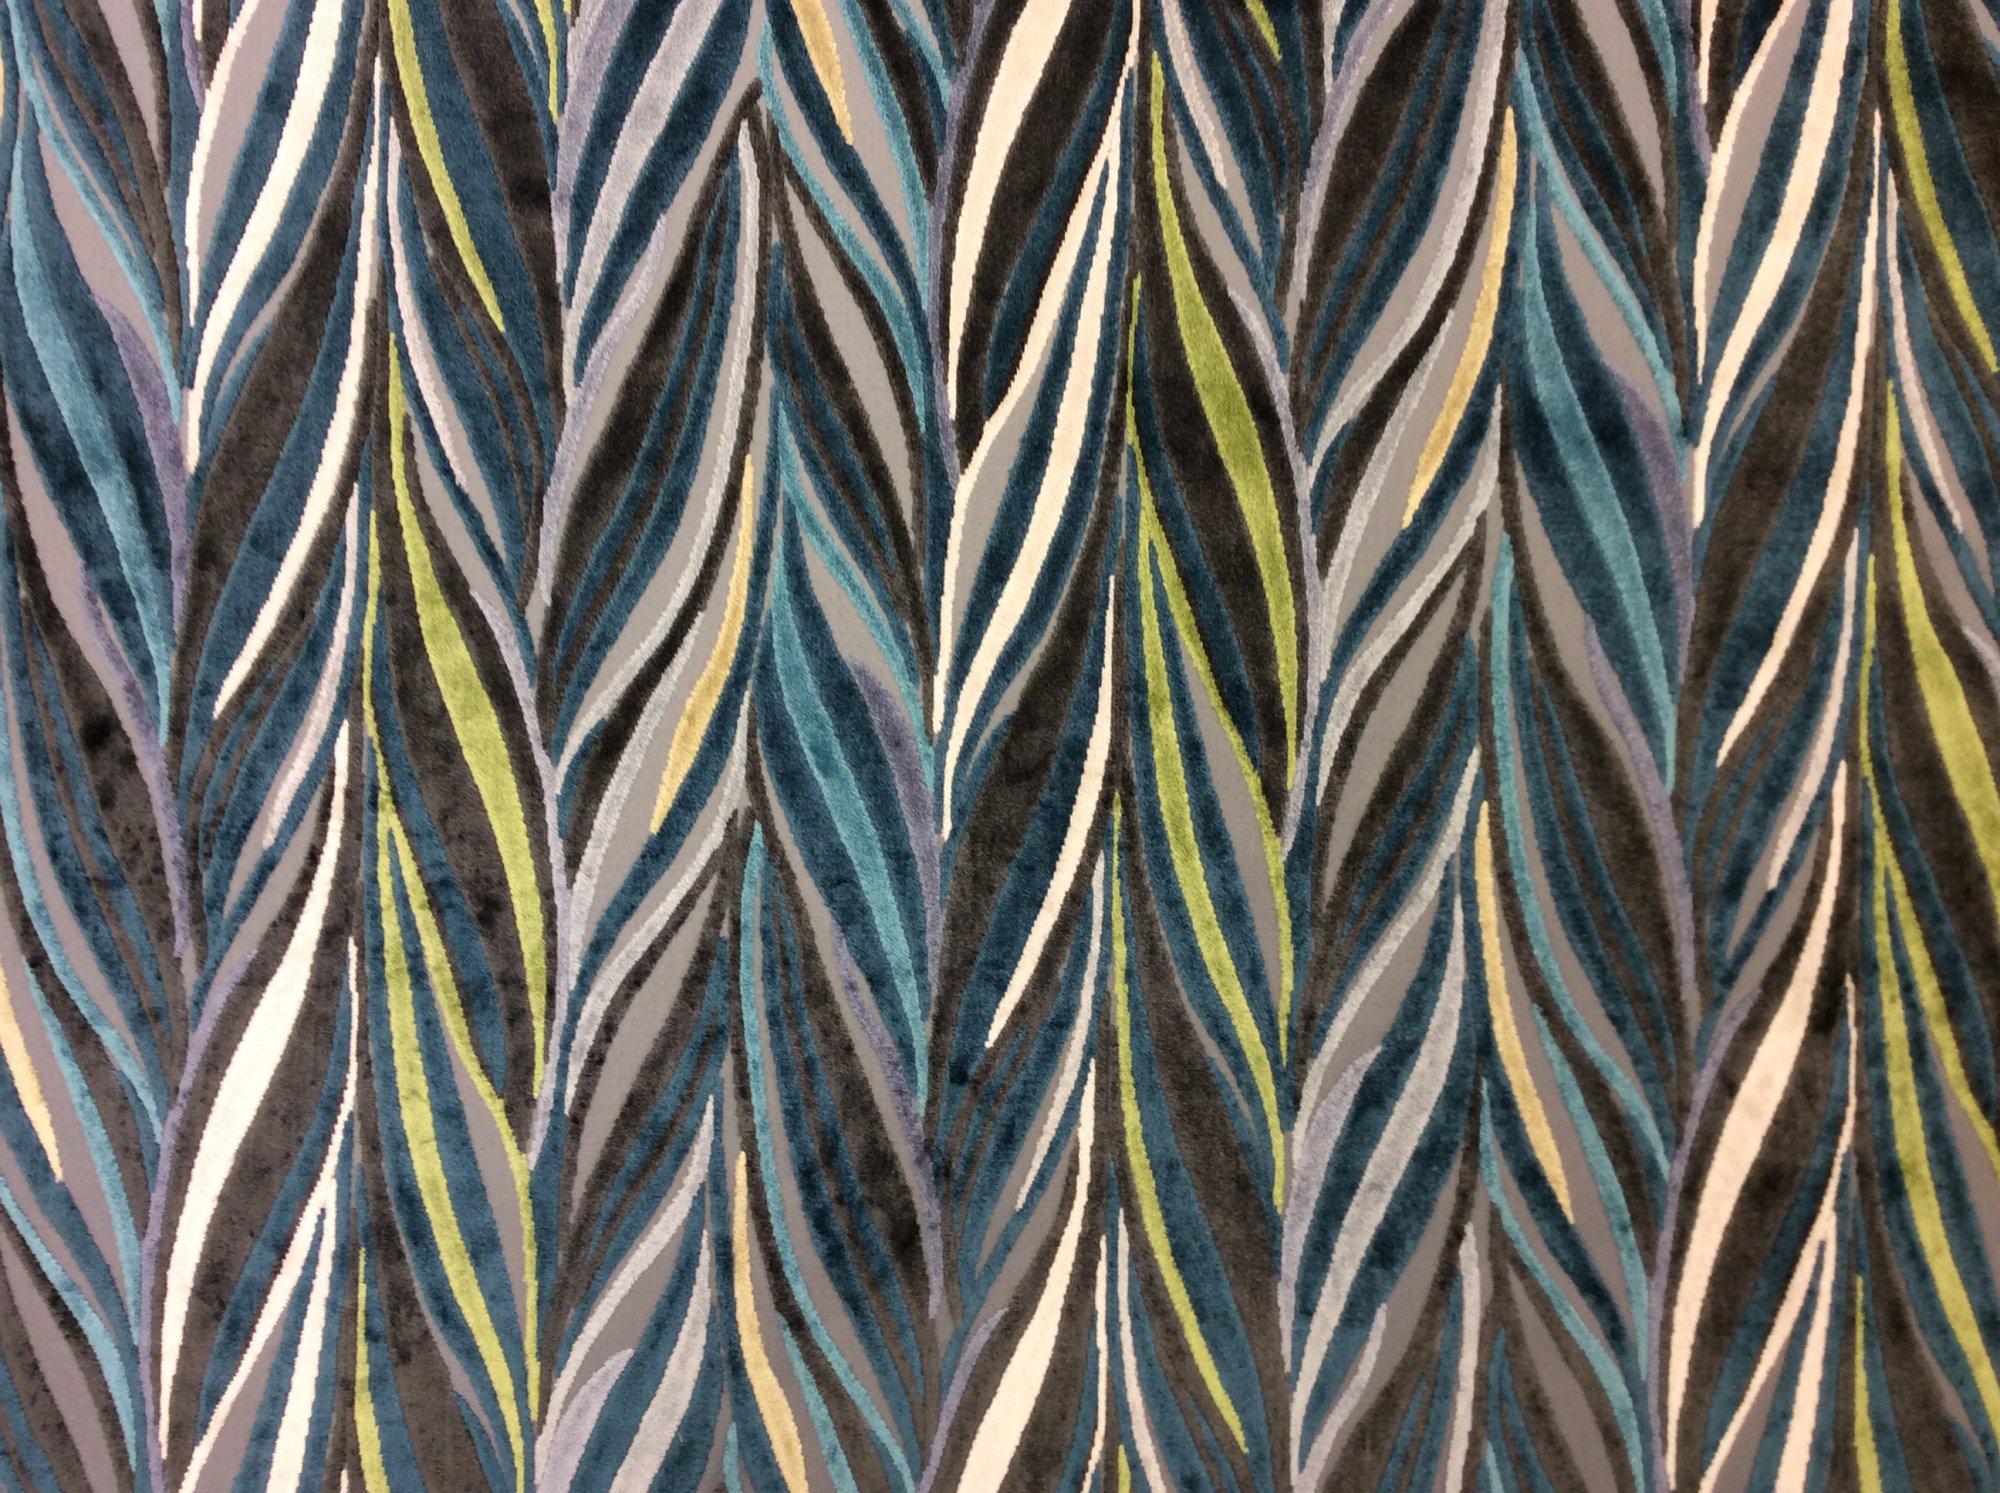 Cut Velvet Aqua Indigo Wave Heavy Upholstery Fabric KGKA01